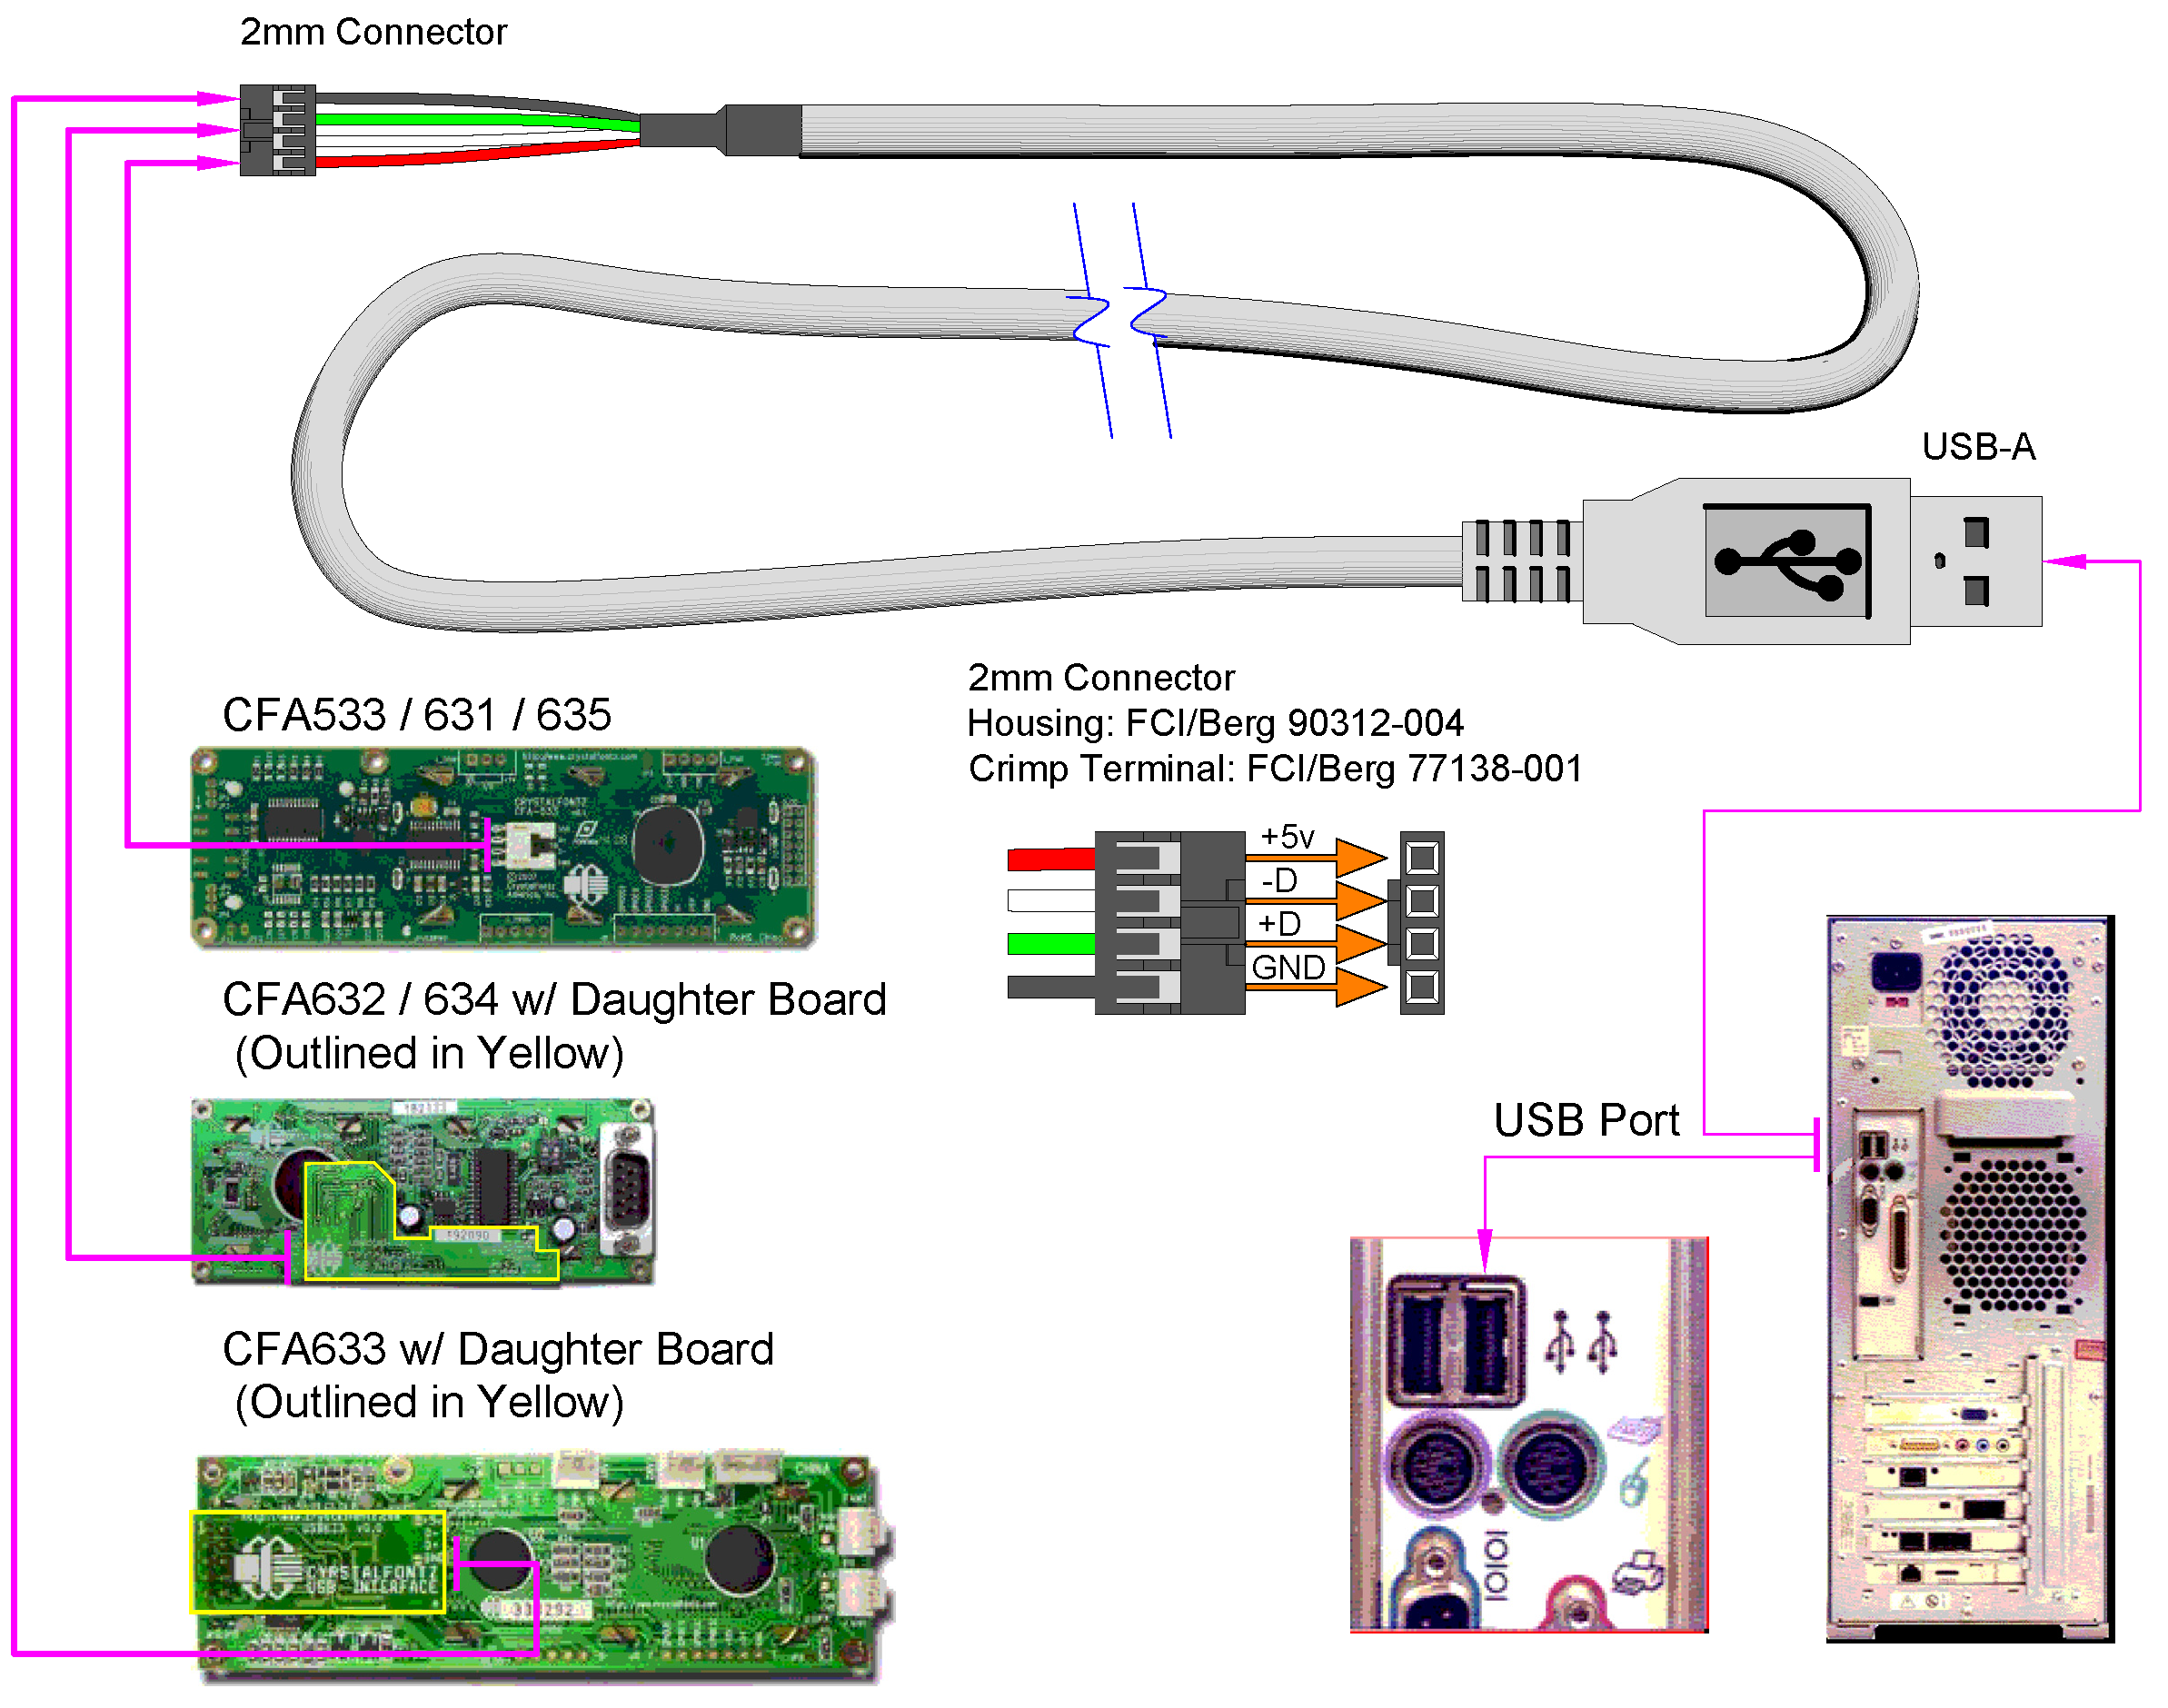 best of wiring diagram micro usb diagrams digramssample diagramimages wiringdiagramsample wiringdiagram [ 2386 x 1880 Pixel ]